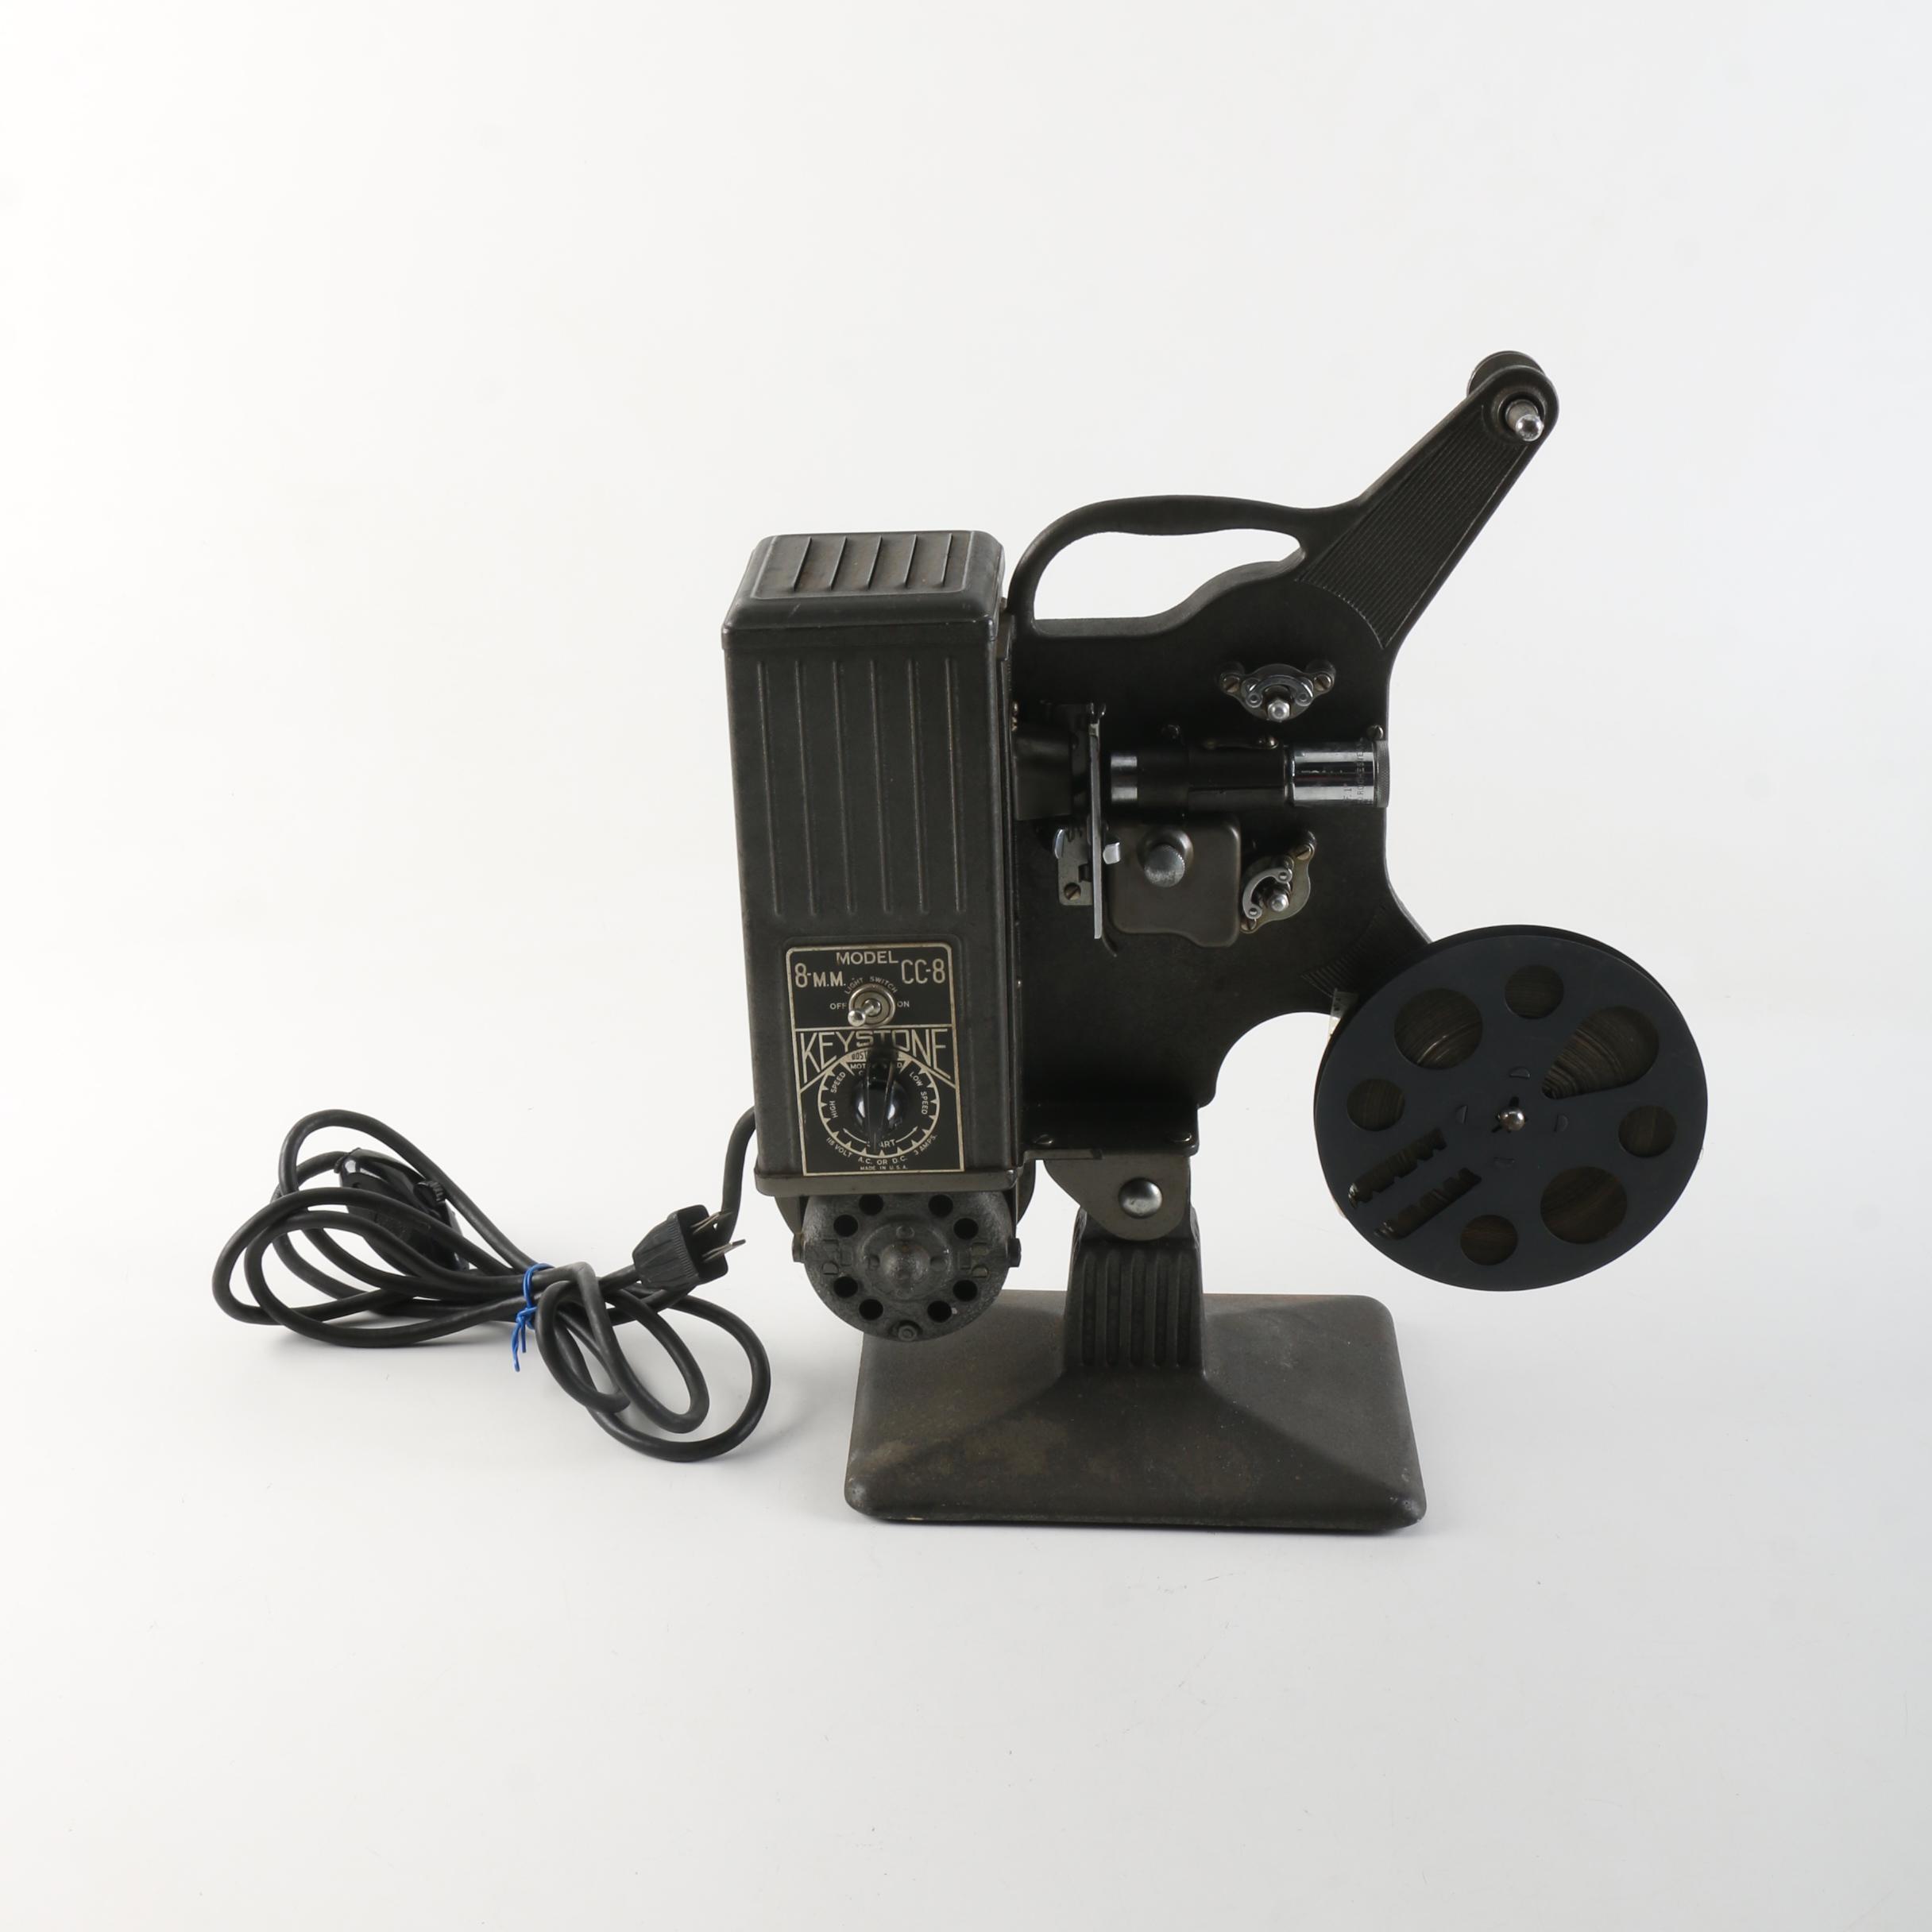 Keystone CC-8 Reel-to-Reel Projector